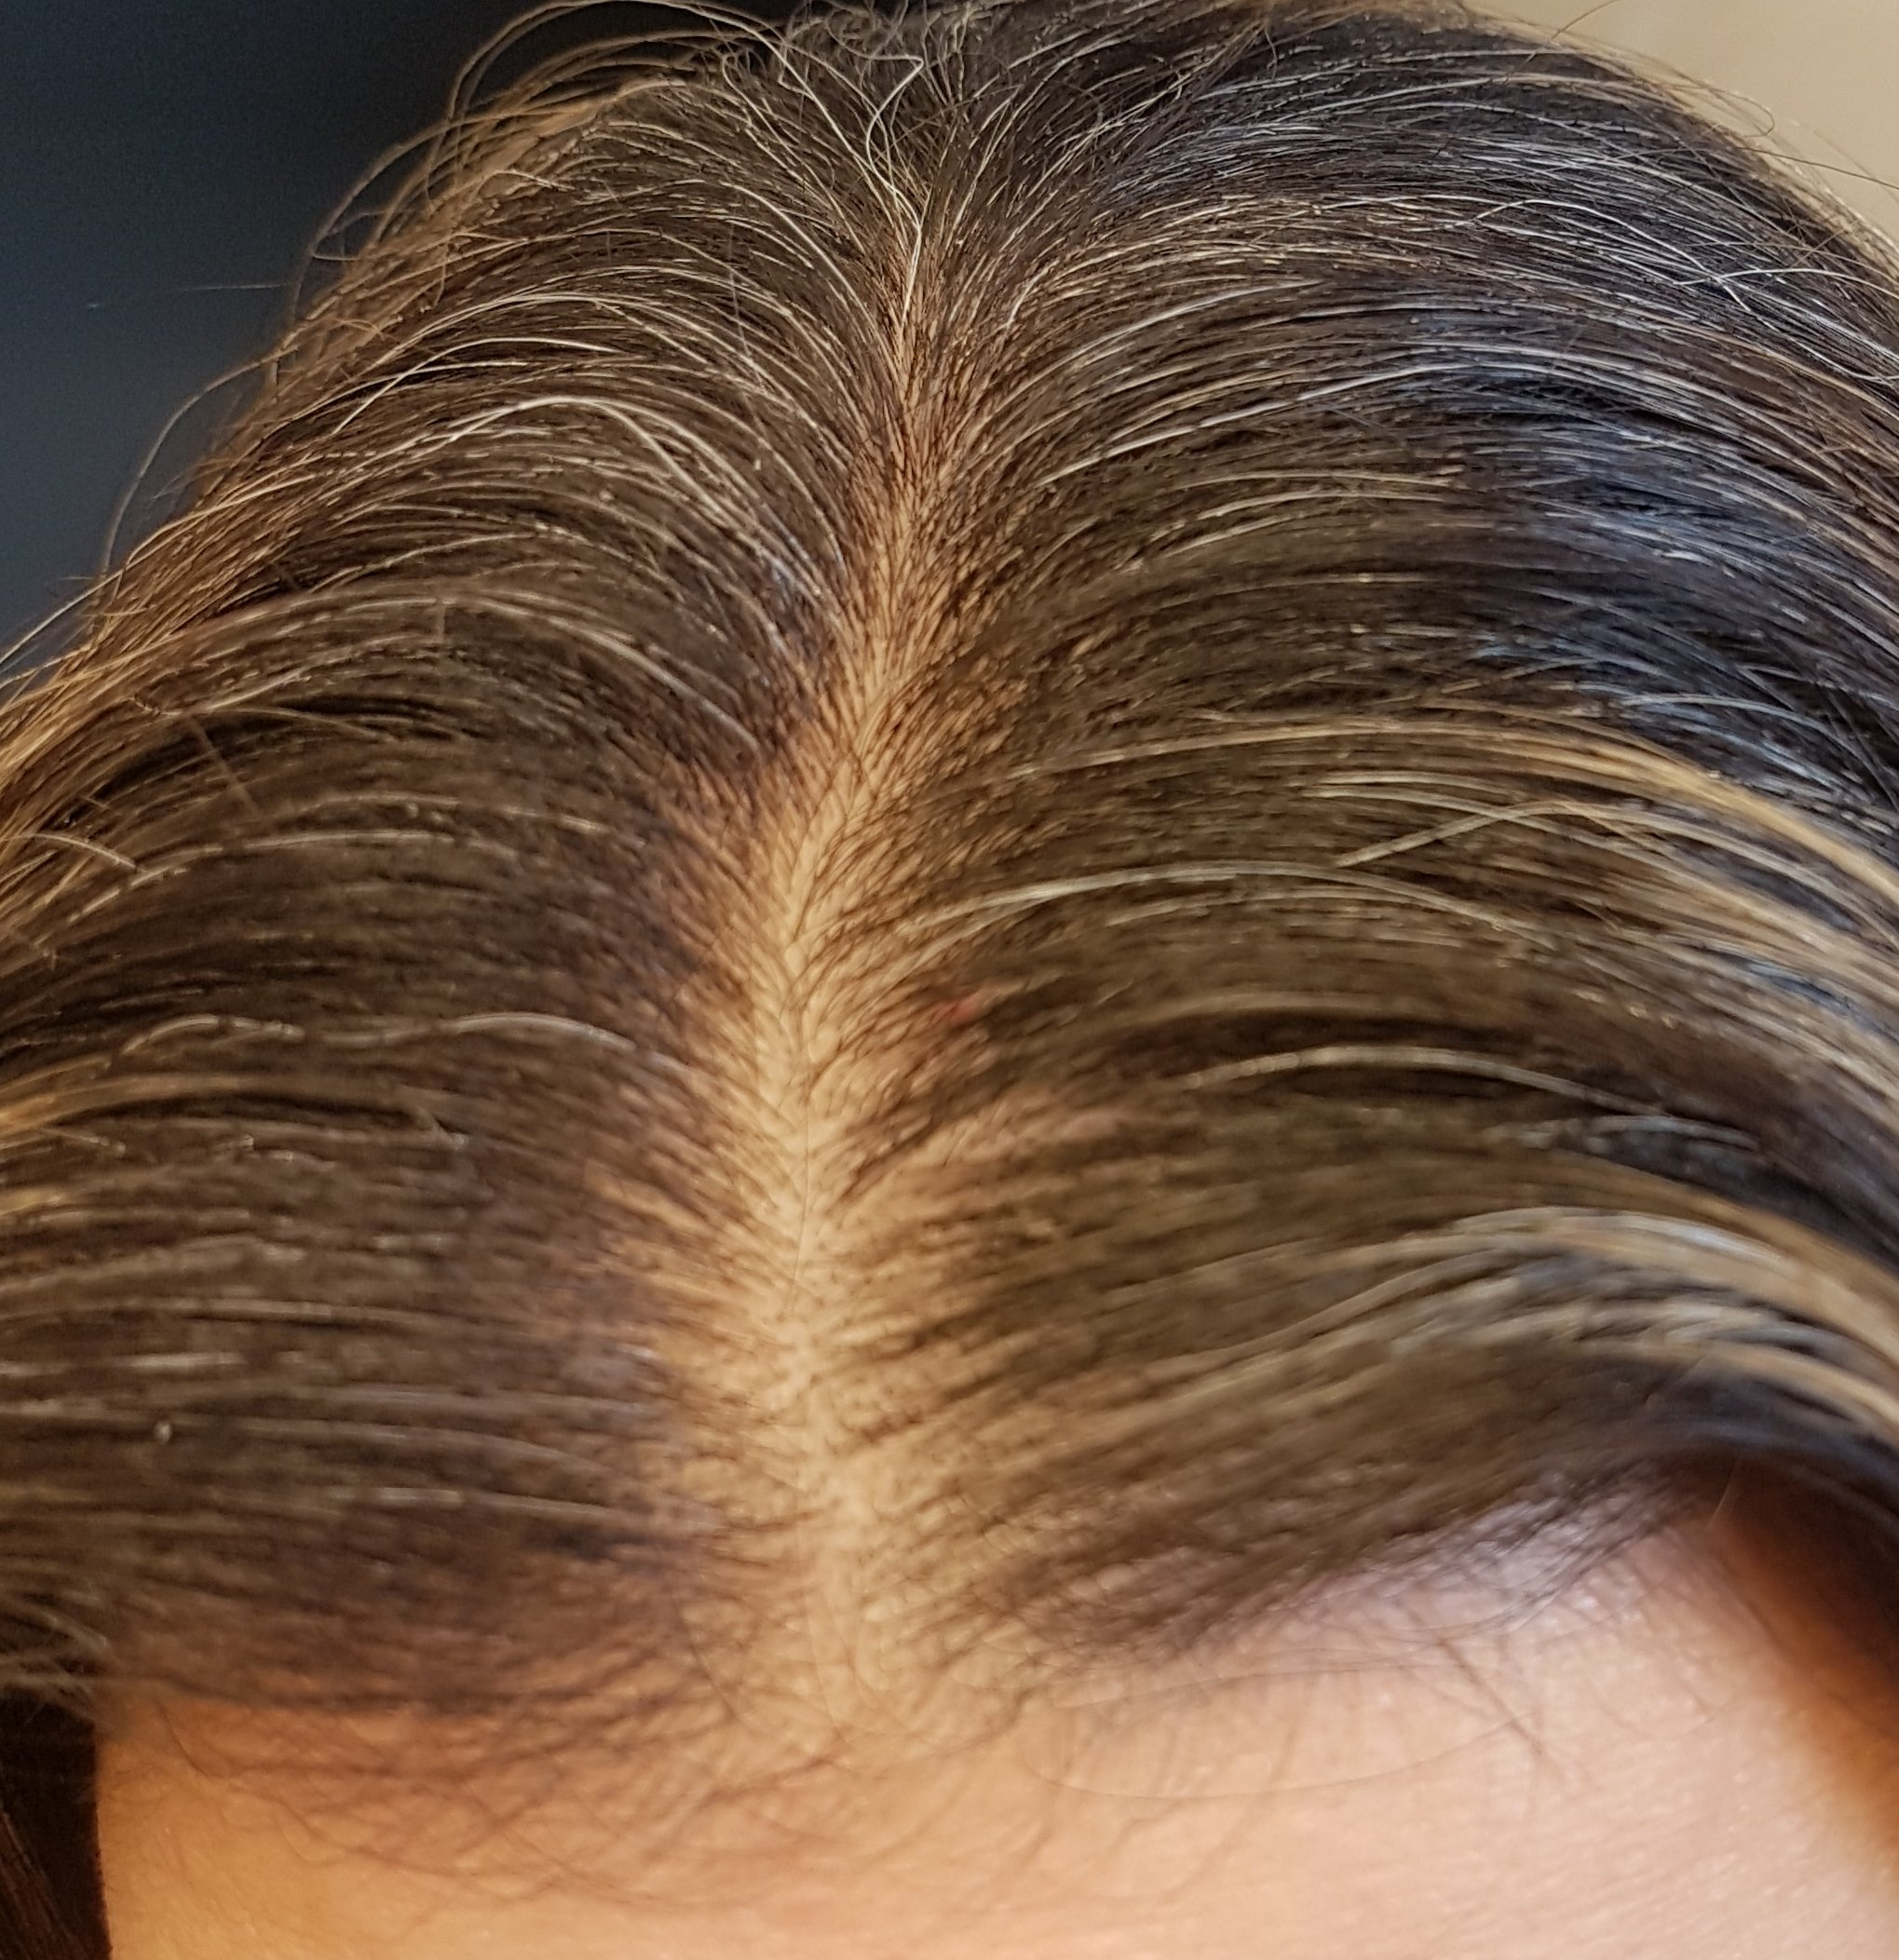 The Ordinary Multi-Peptide Serum for Hair Density | Raiyne